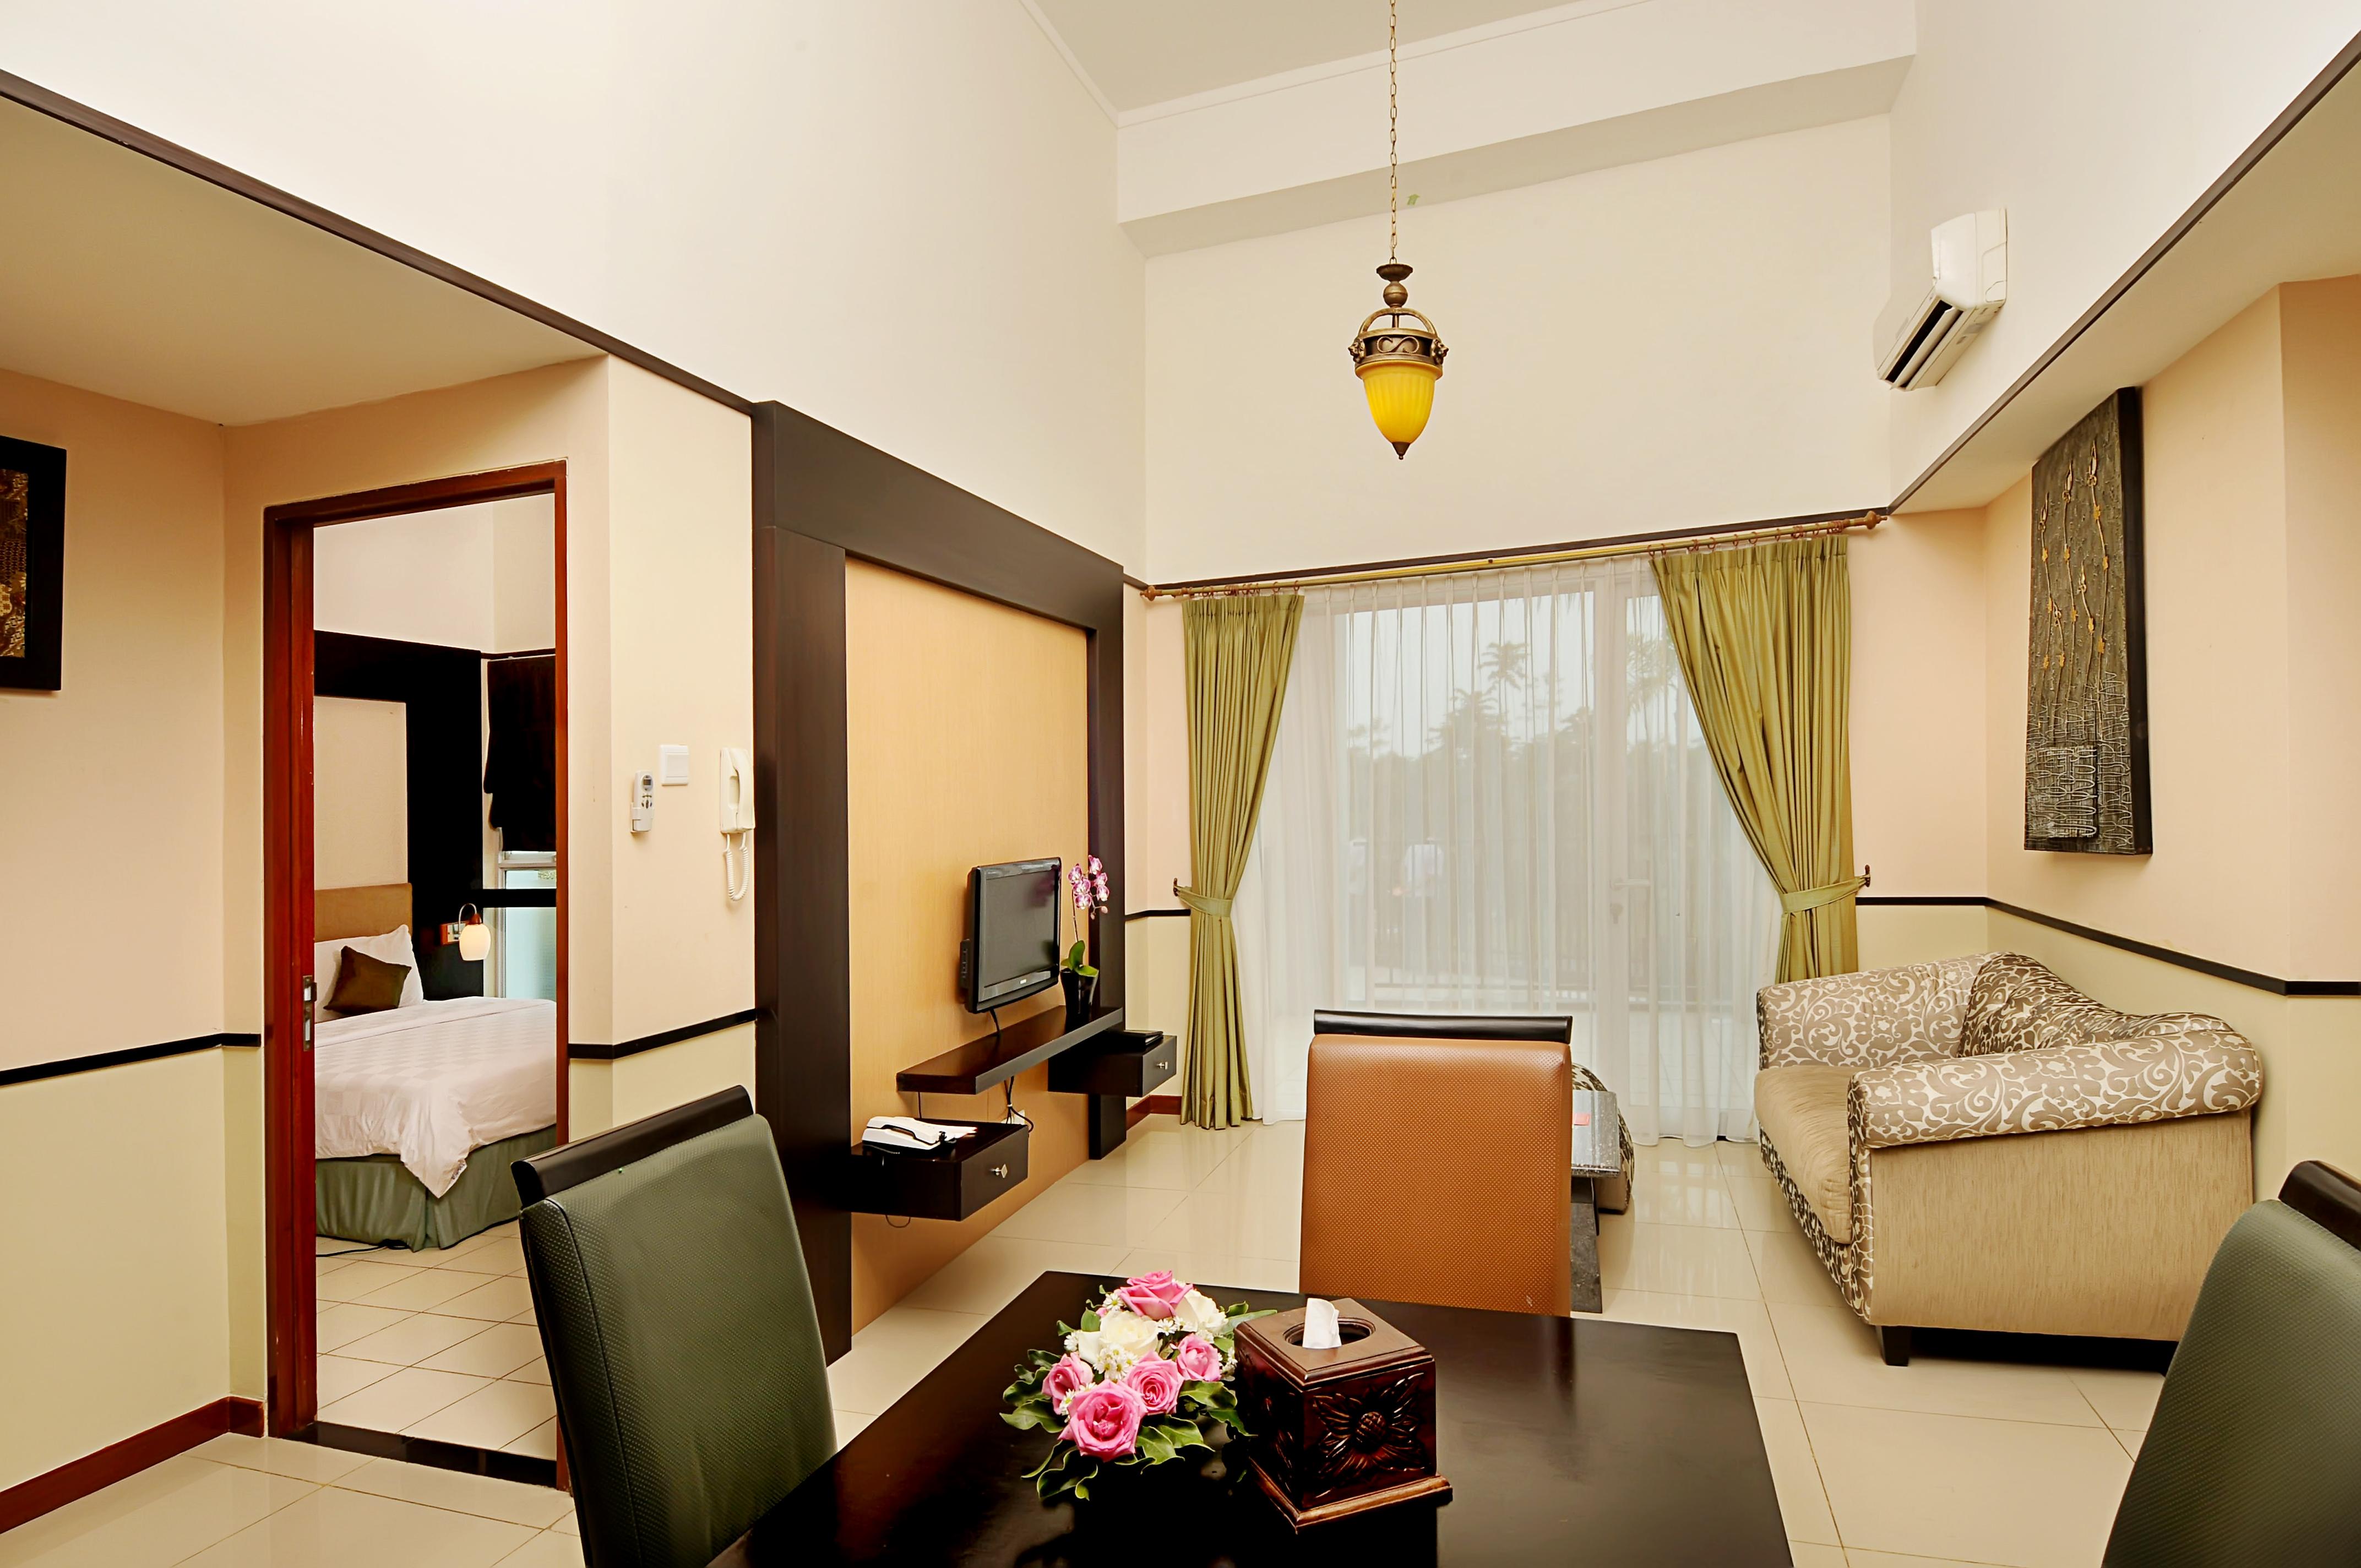 Executive Suite Marbella Suites Bandung